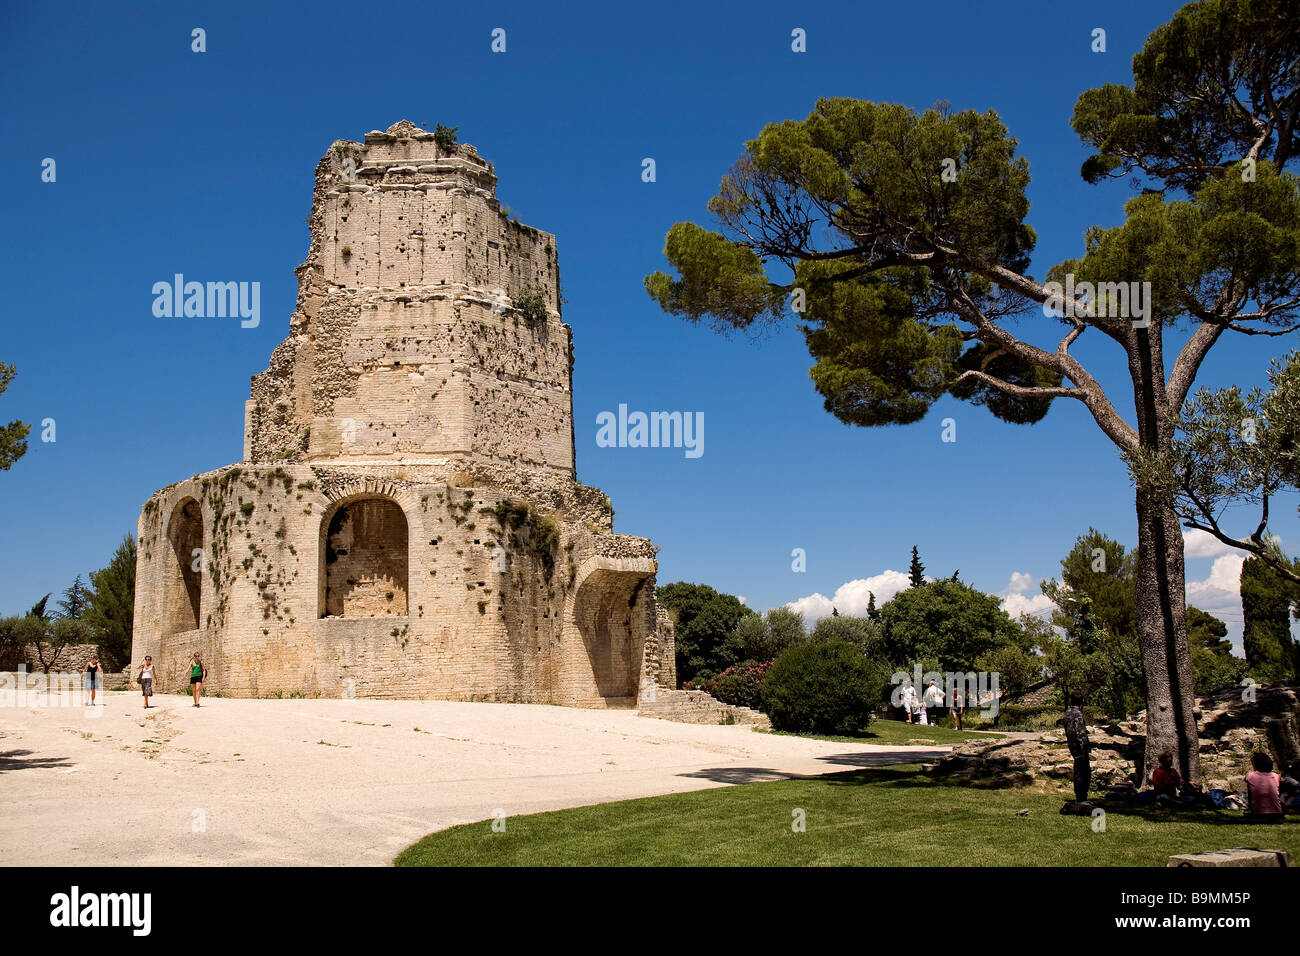 France gard nimes tour magne gallo roman tower in jardins de la stock photo royalty free - Tour magne nimes ...